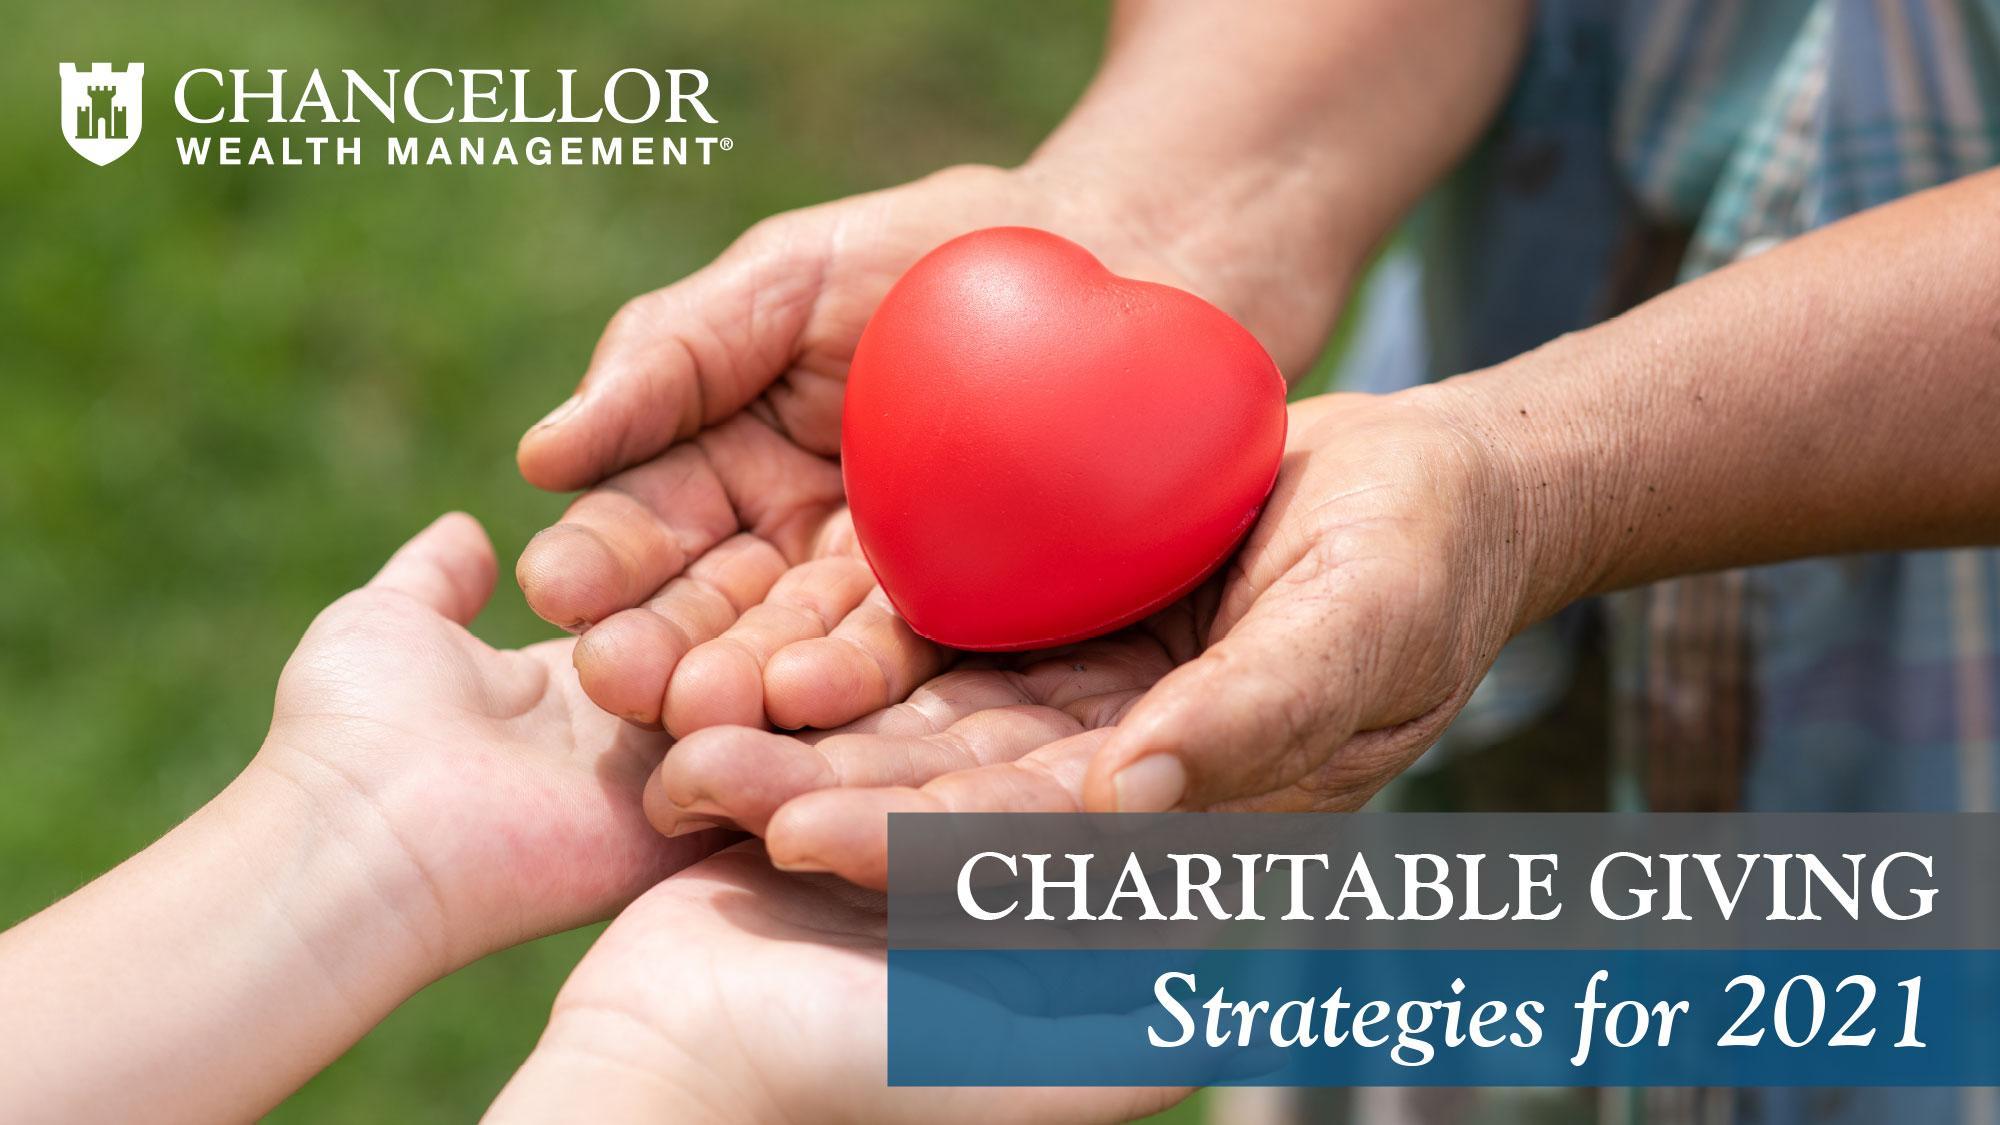 Charitable Giving Strategies for 2021 Thumbnail